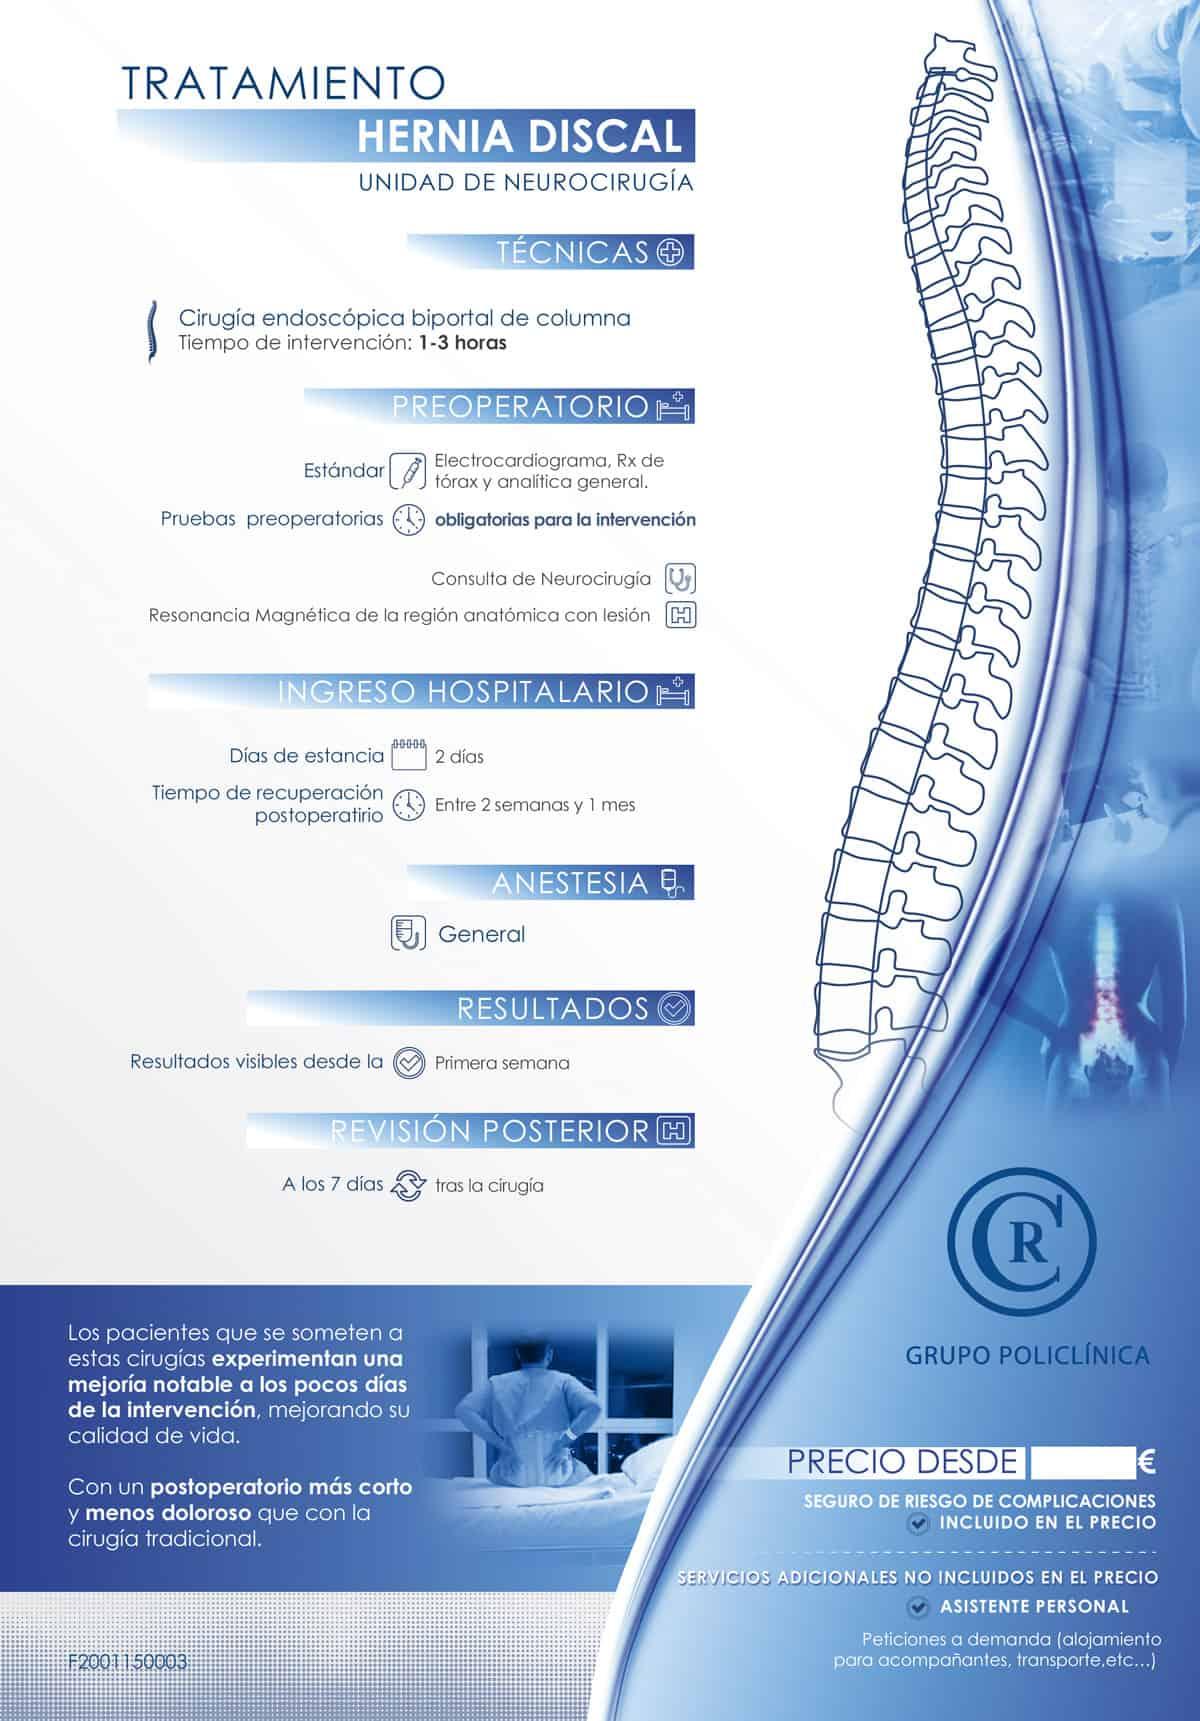 Tratamiento hernia discal 1